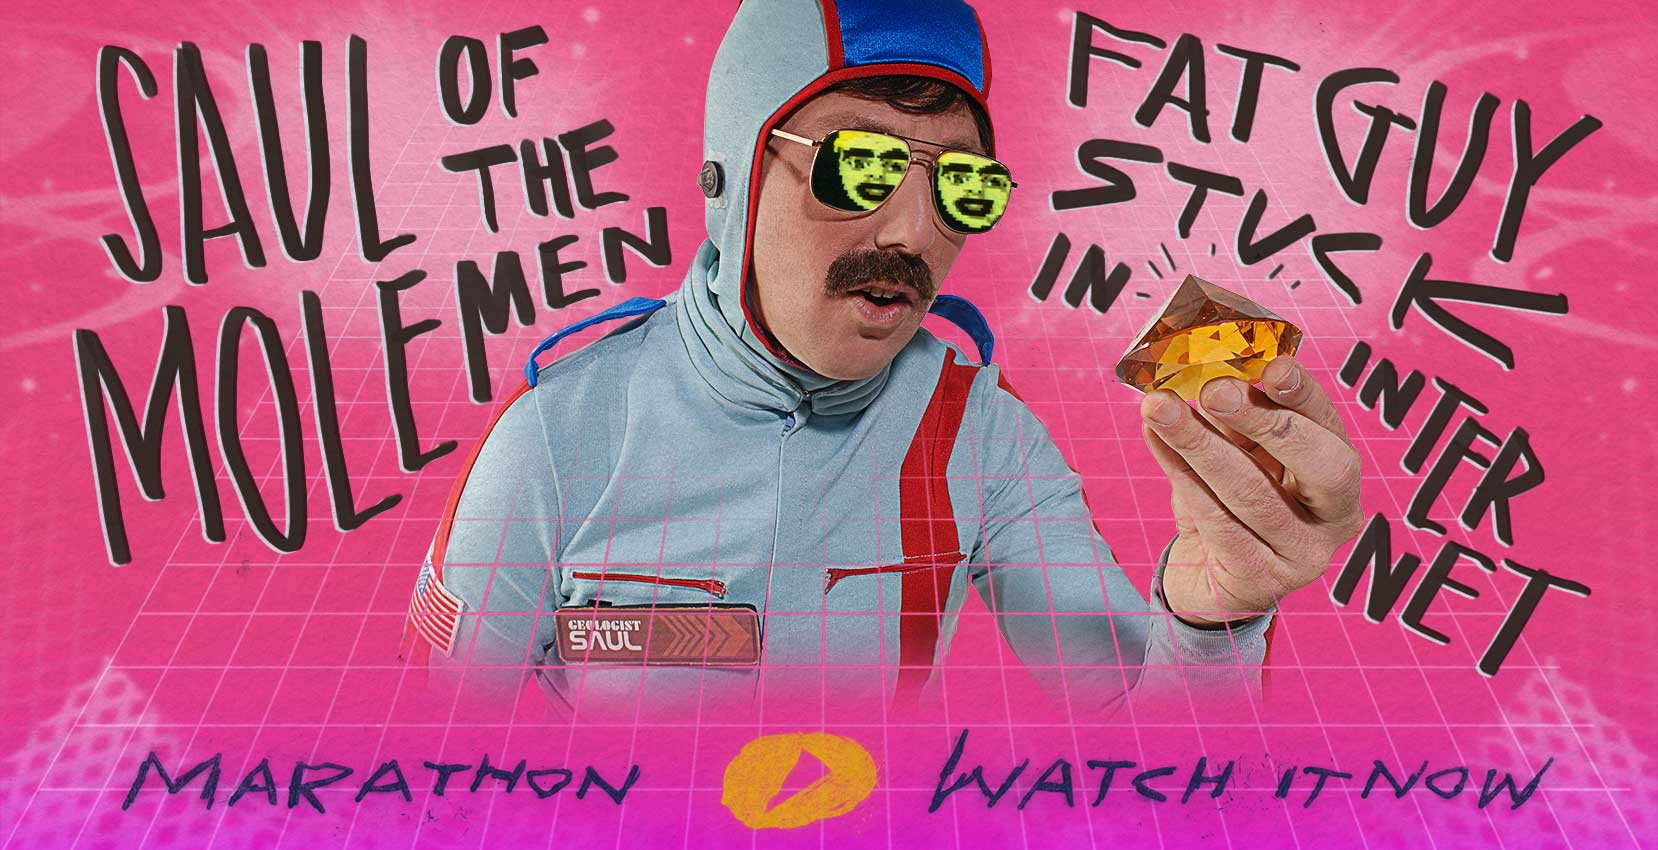 Fat Guy Stuck in Internet / Saul of the Mole Men Marathon